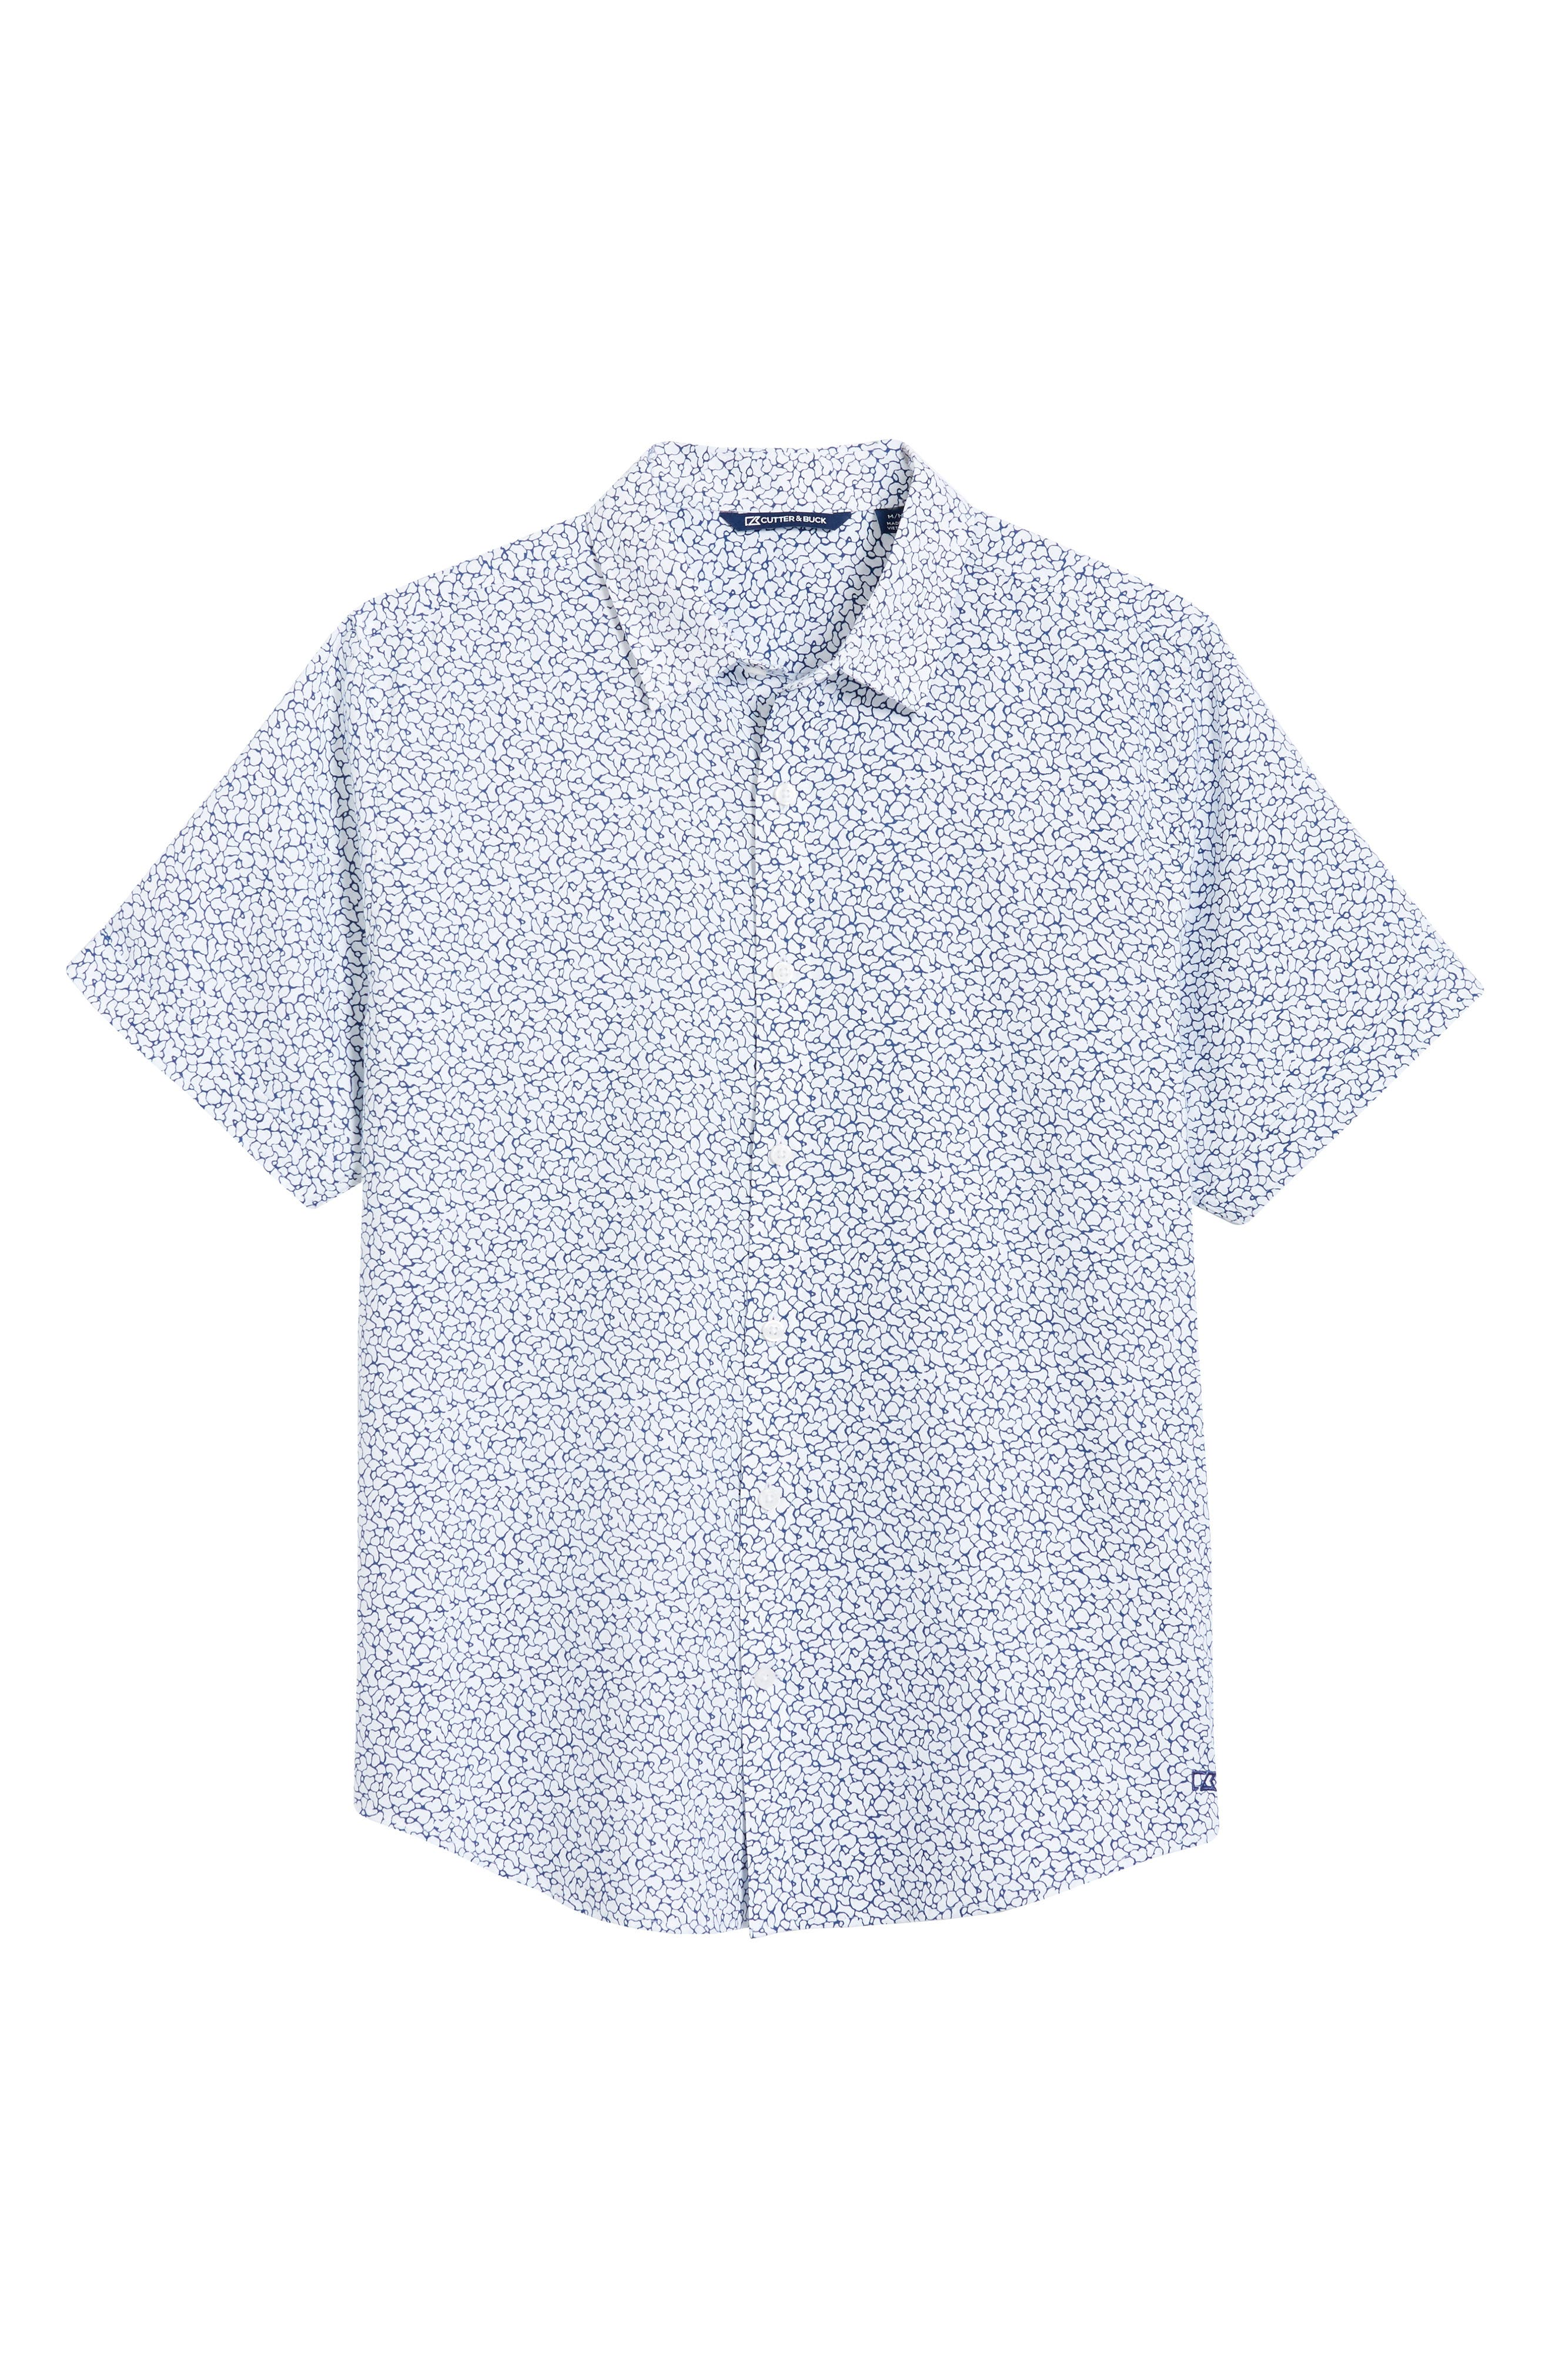 Windward Mineral Short Sleeve Button-Up Shirt